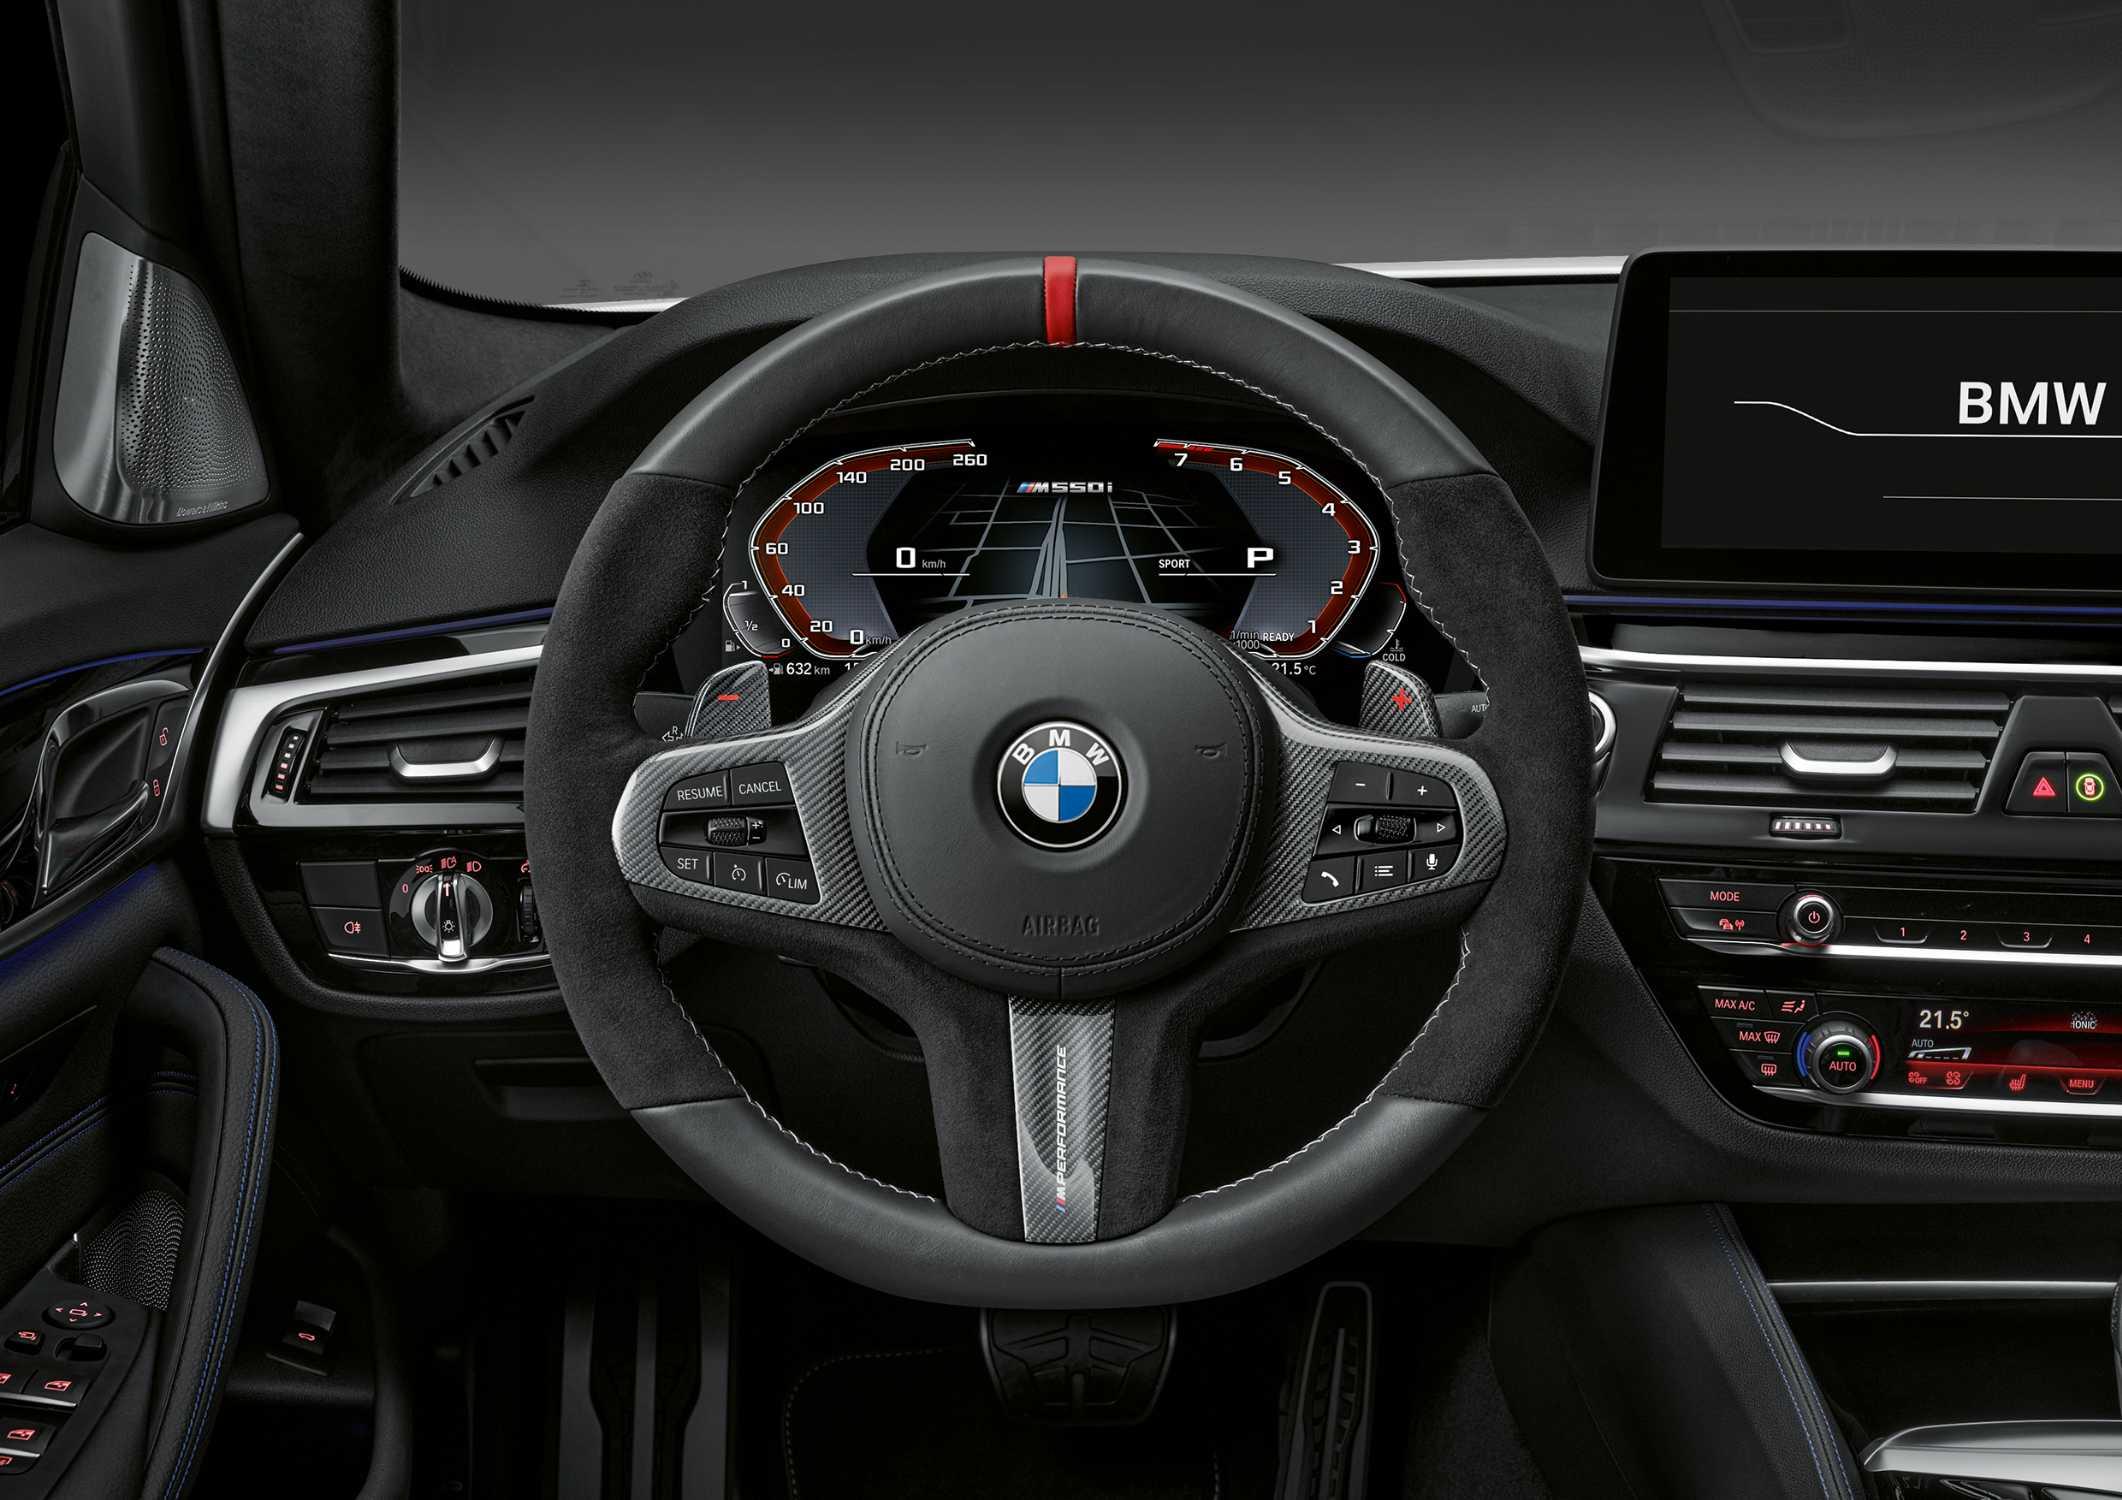 The new BMW 5 Series, M Performance Steering Wheel (05/2020)